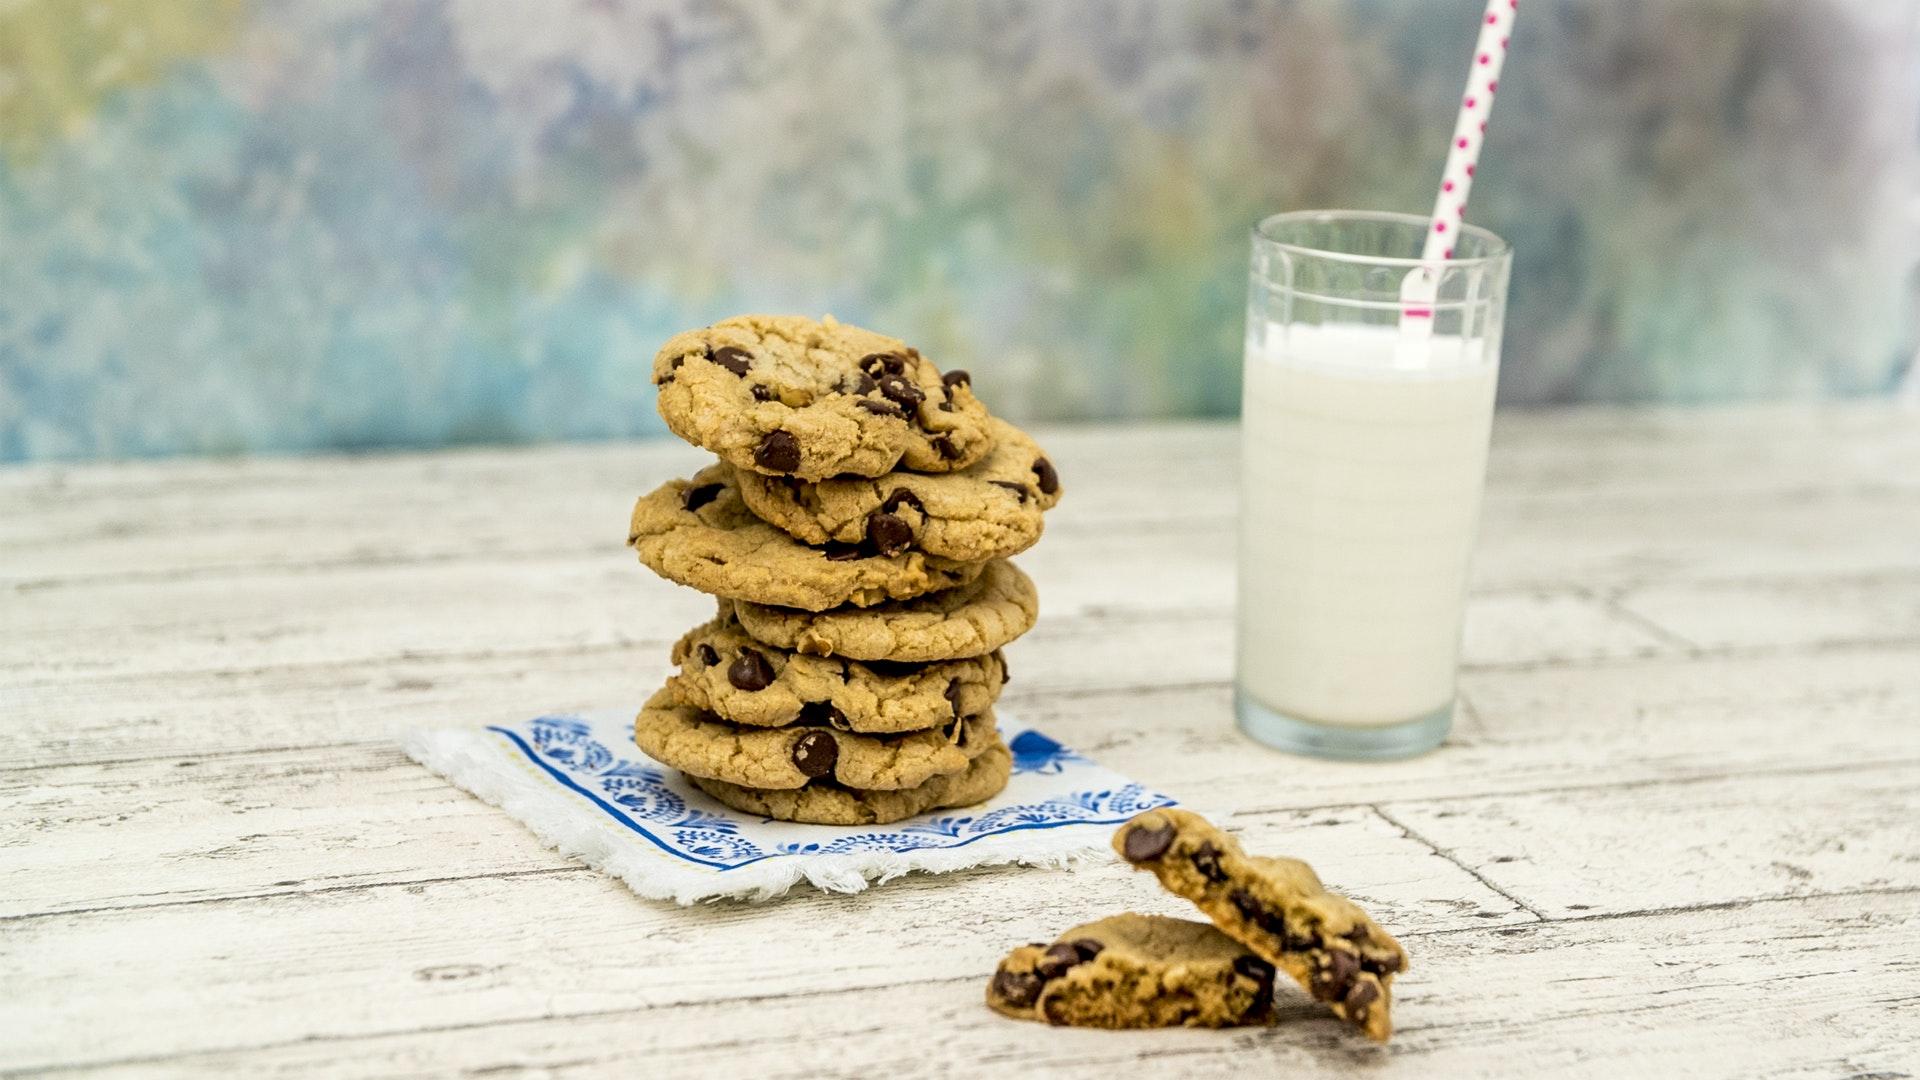 pxqrocxwsjcc_6EWZbEFRHaQguC4yEcm48a_Best-Ever-Chocolate-Chip-Cookies_landscapeThumbnail_en-US.jpeg